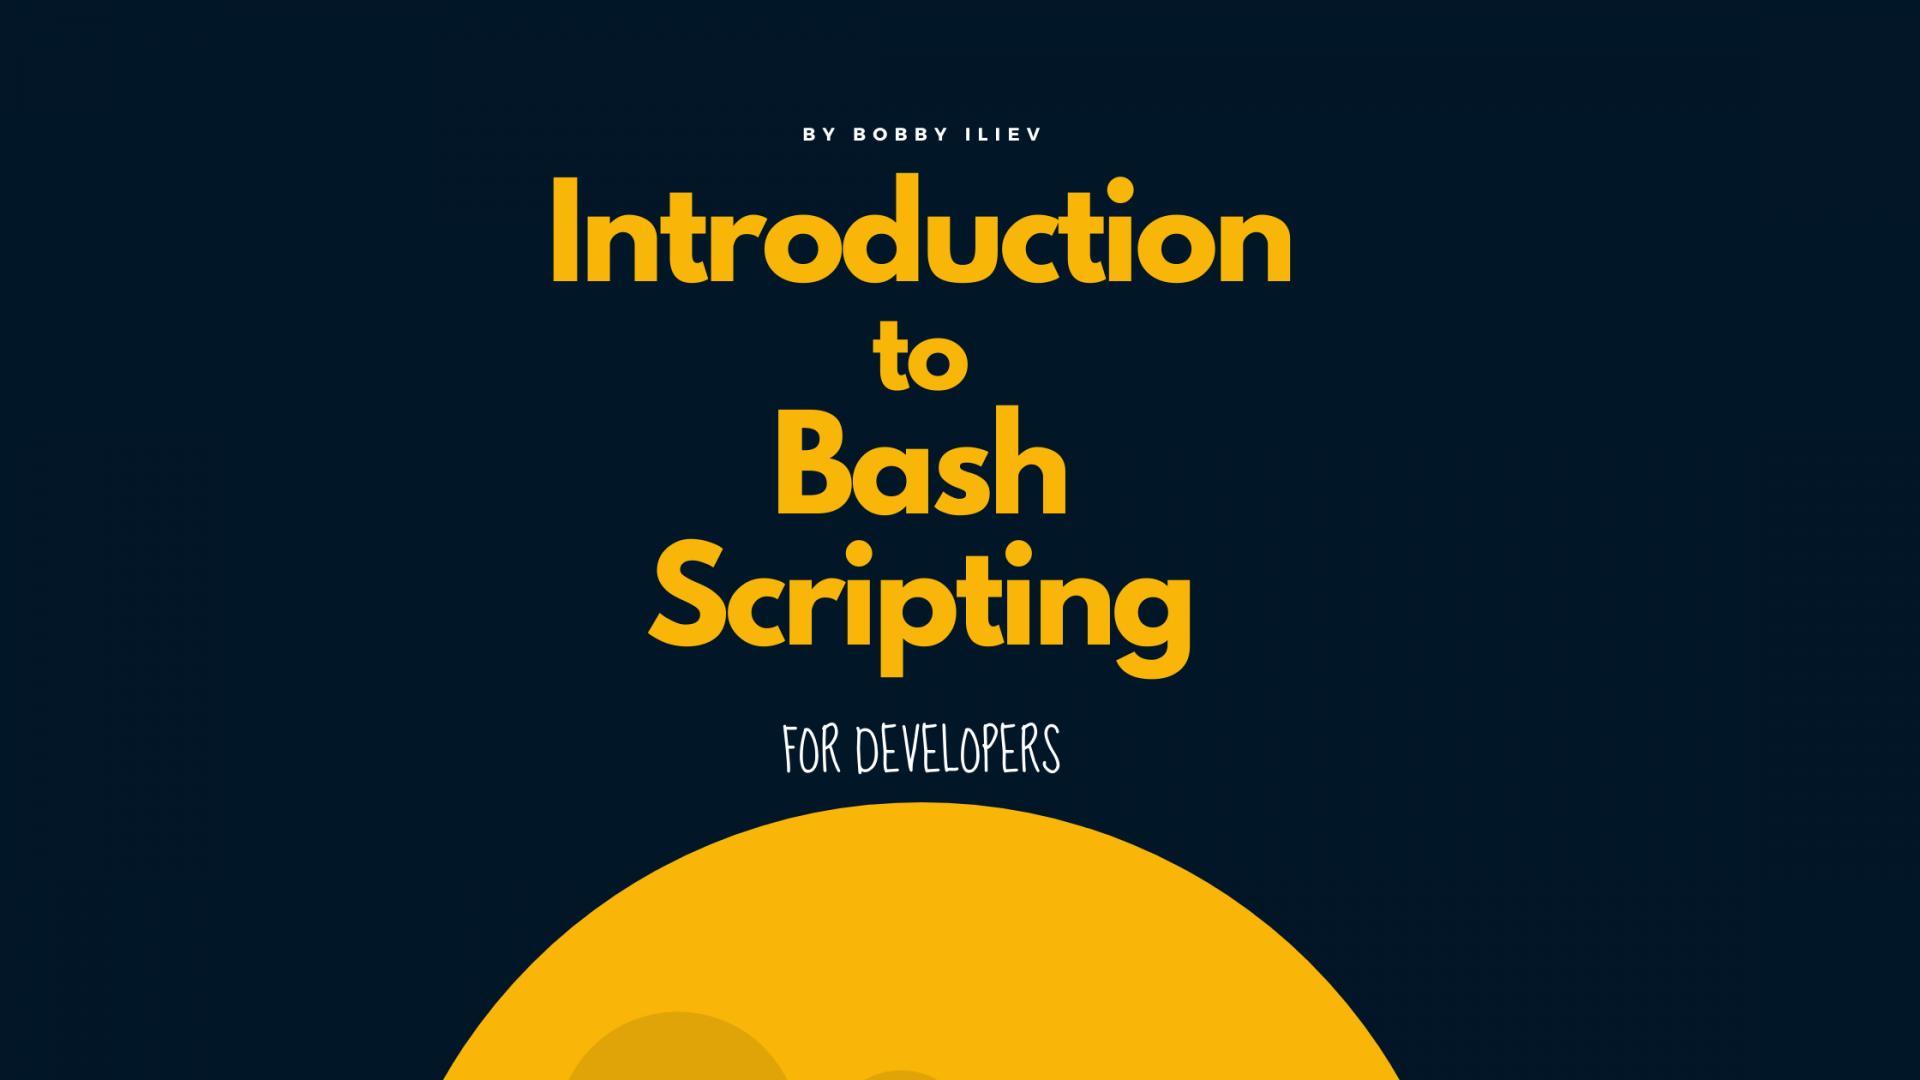 [Video] Bash Scripting Crash Course + Giveaway ⭐